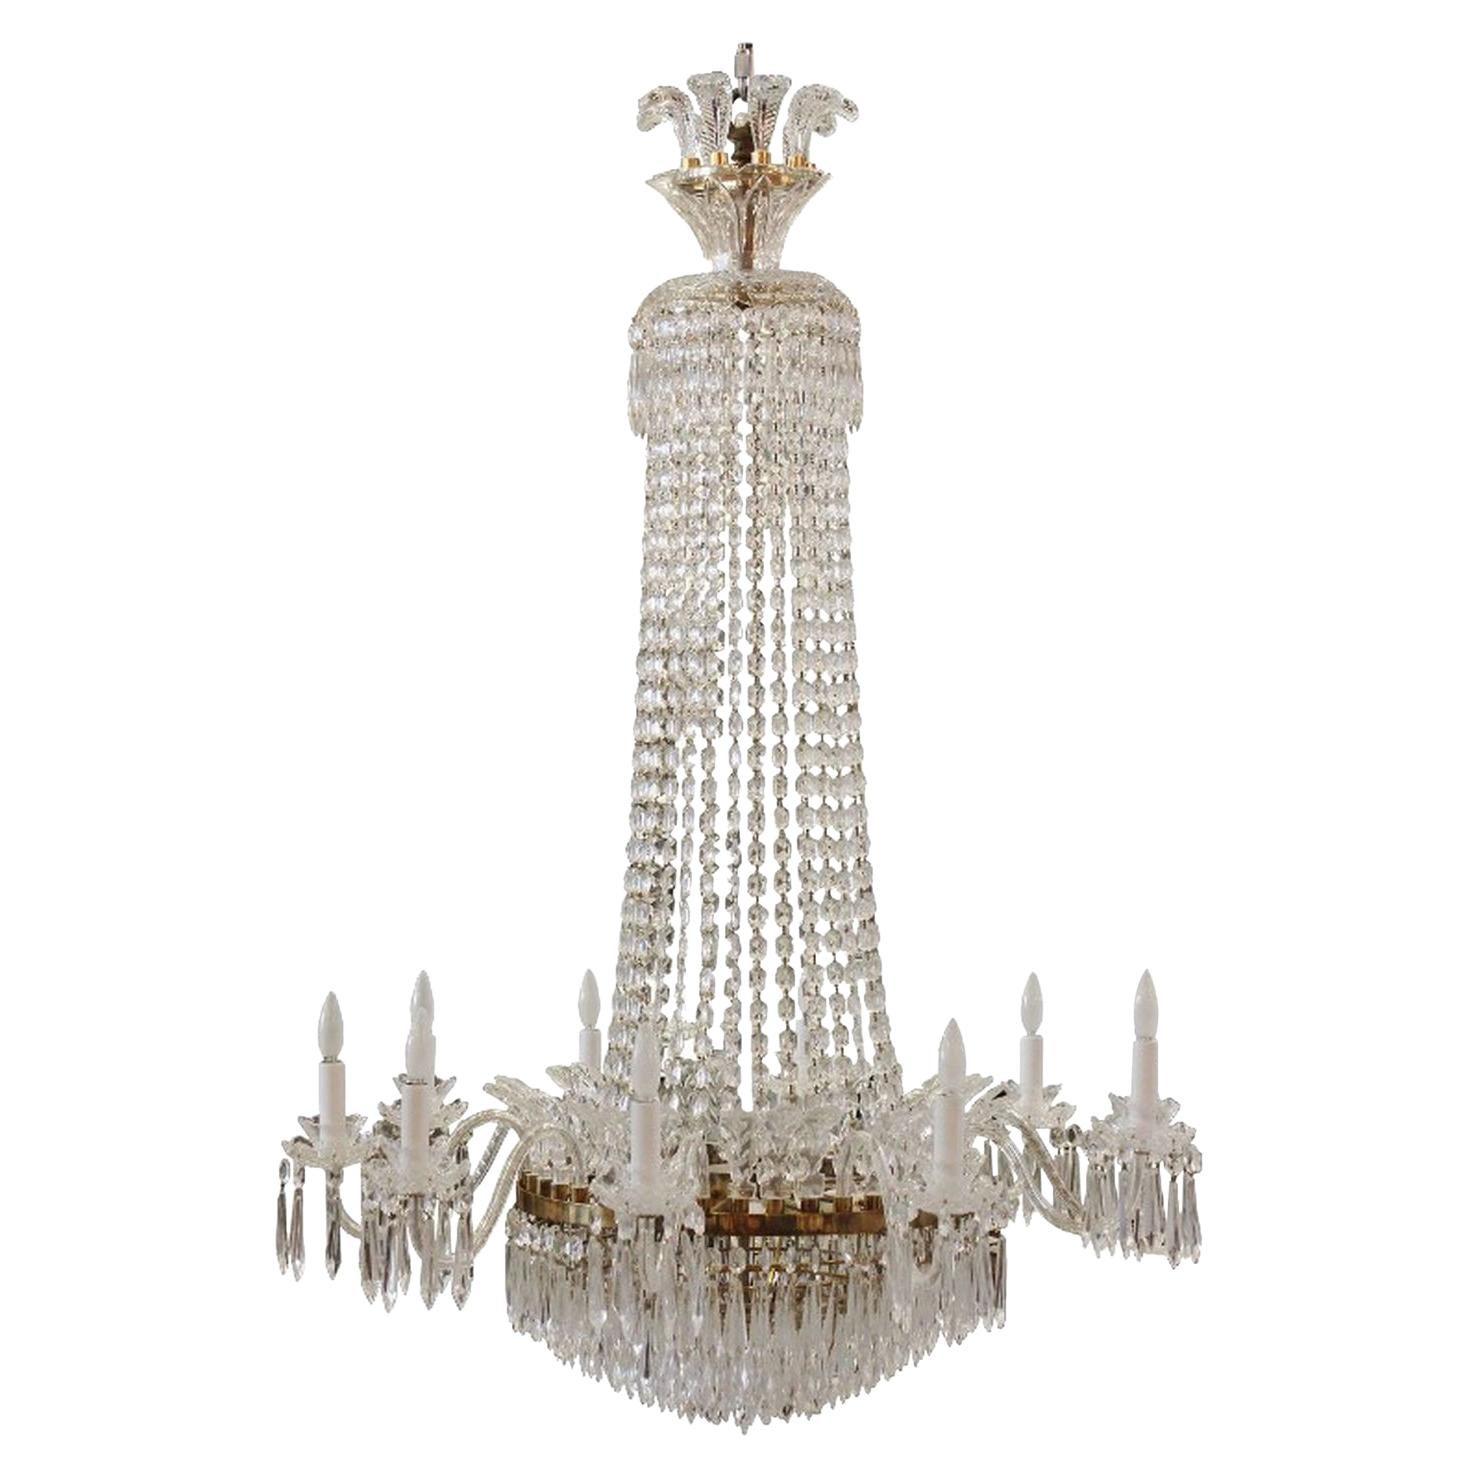 Massive Custom Waterford Crystal Chandelier